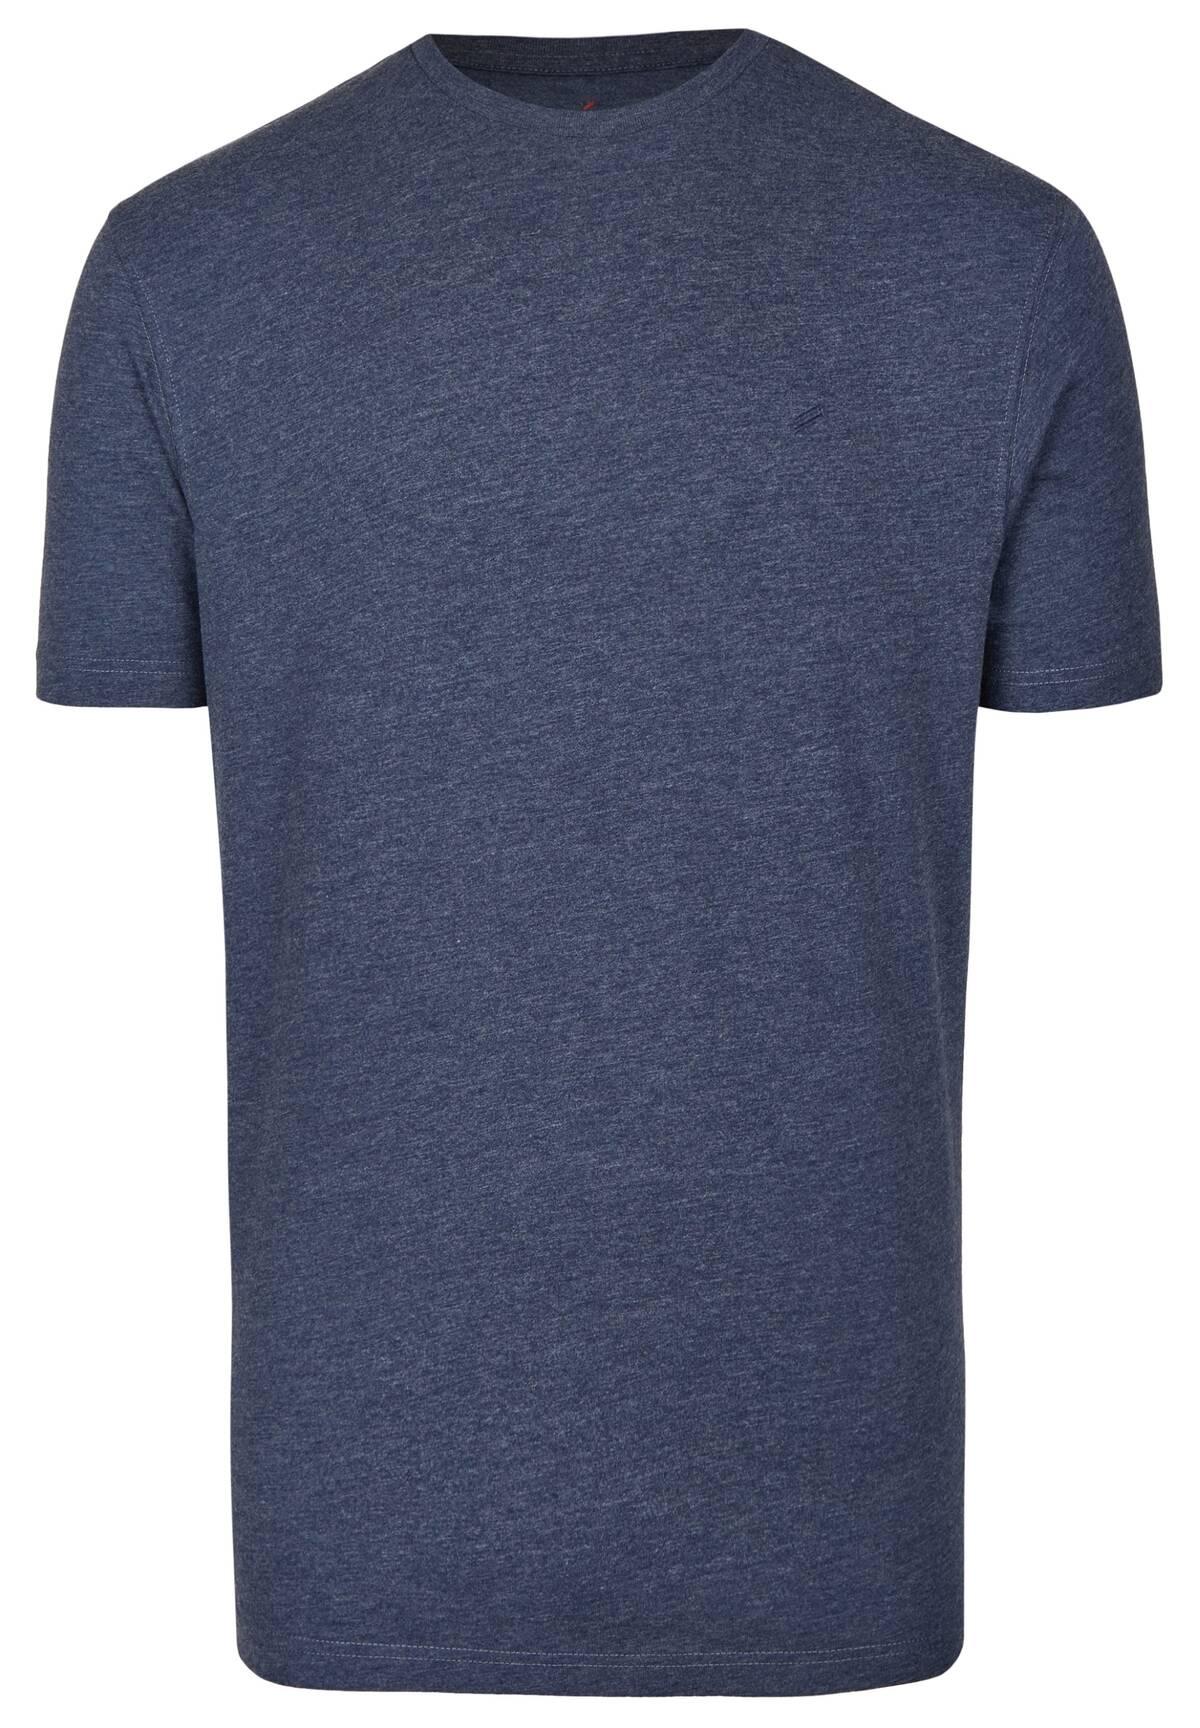 T-shirt uni col rond /